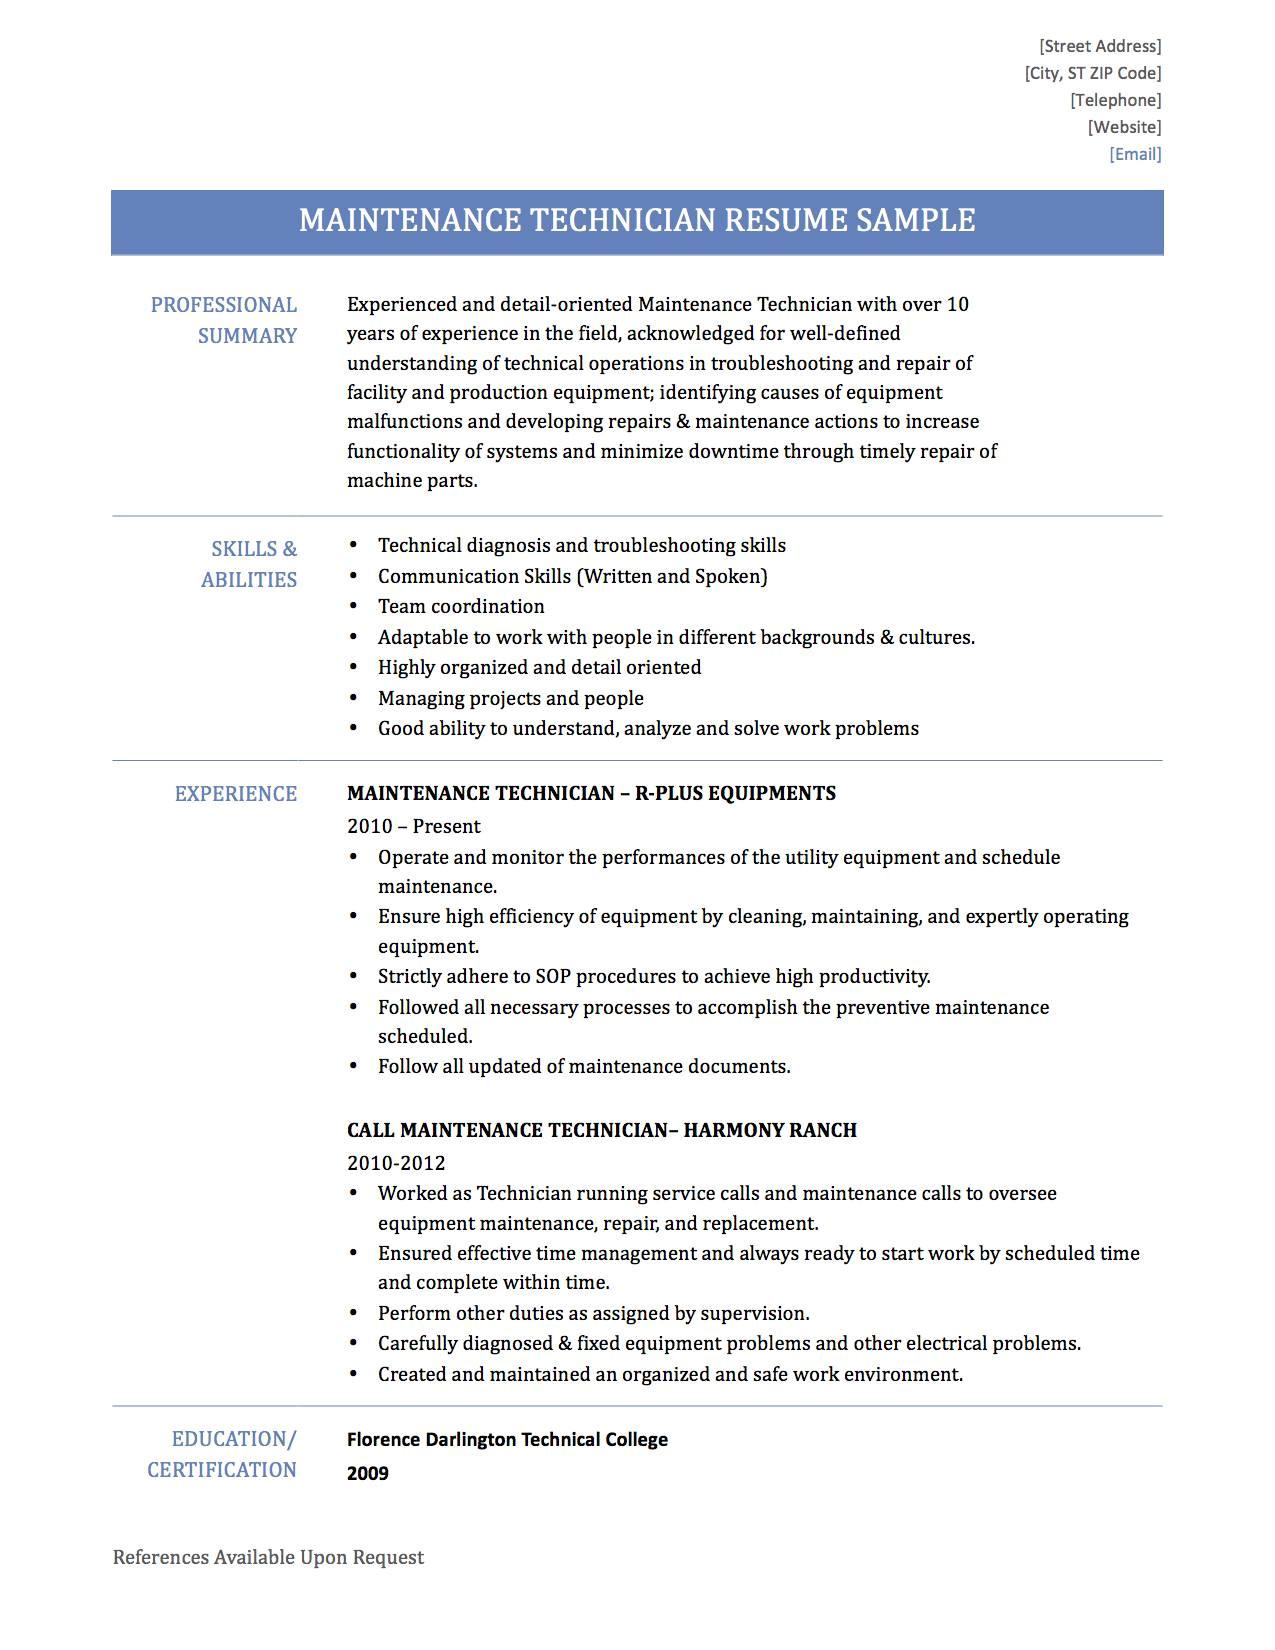 sample resume for subway sandwich artist inspirational maintenance resume sample 1 technician samples fr peppapp